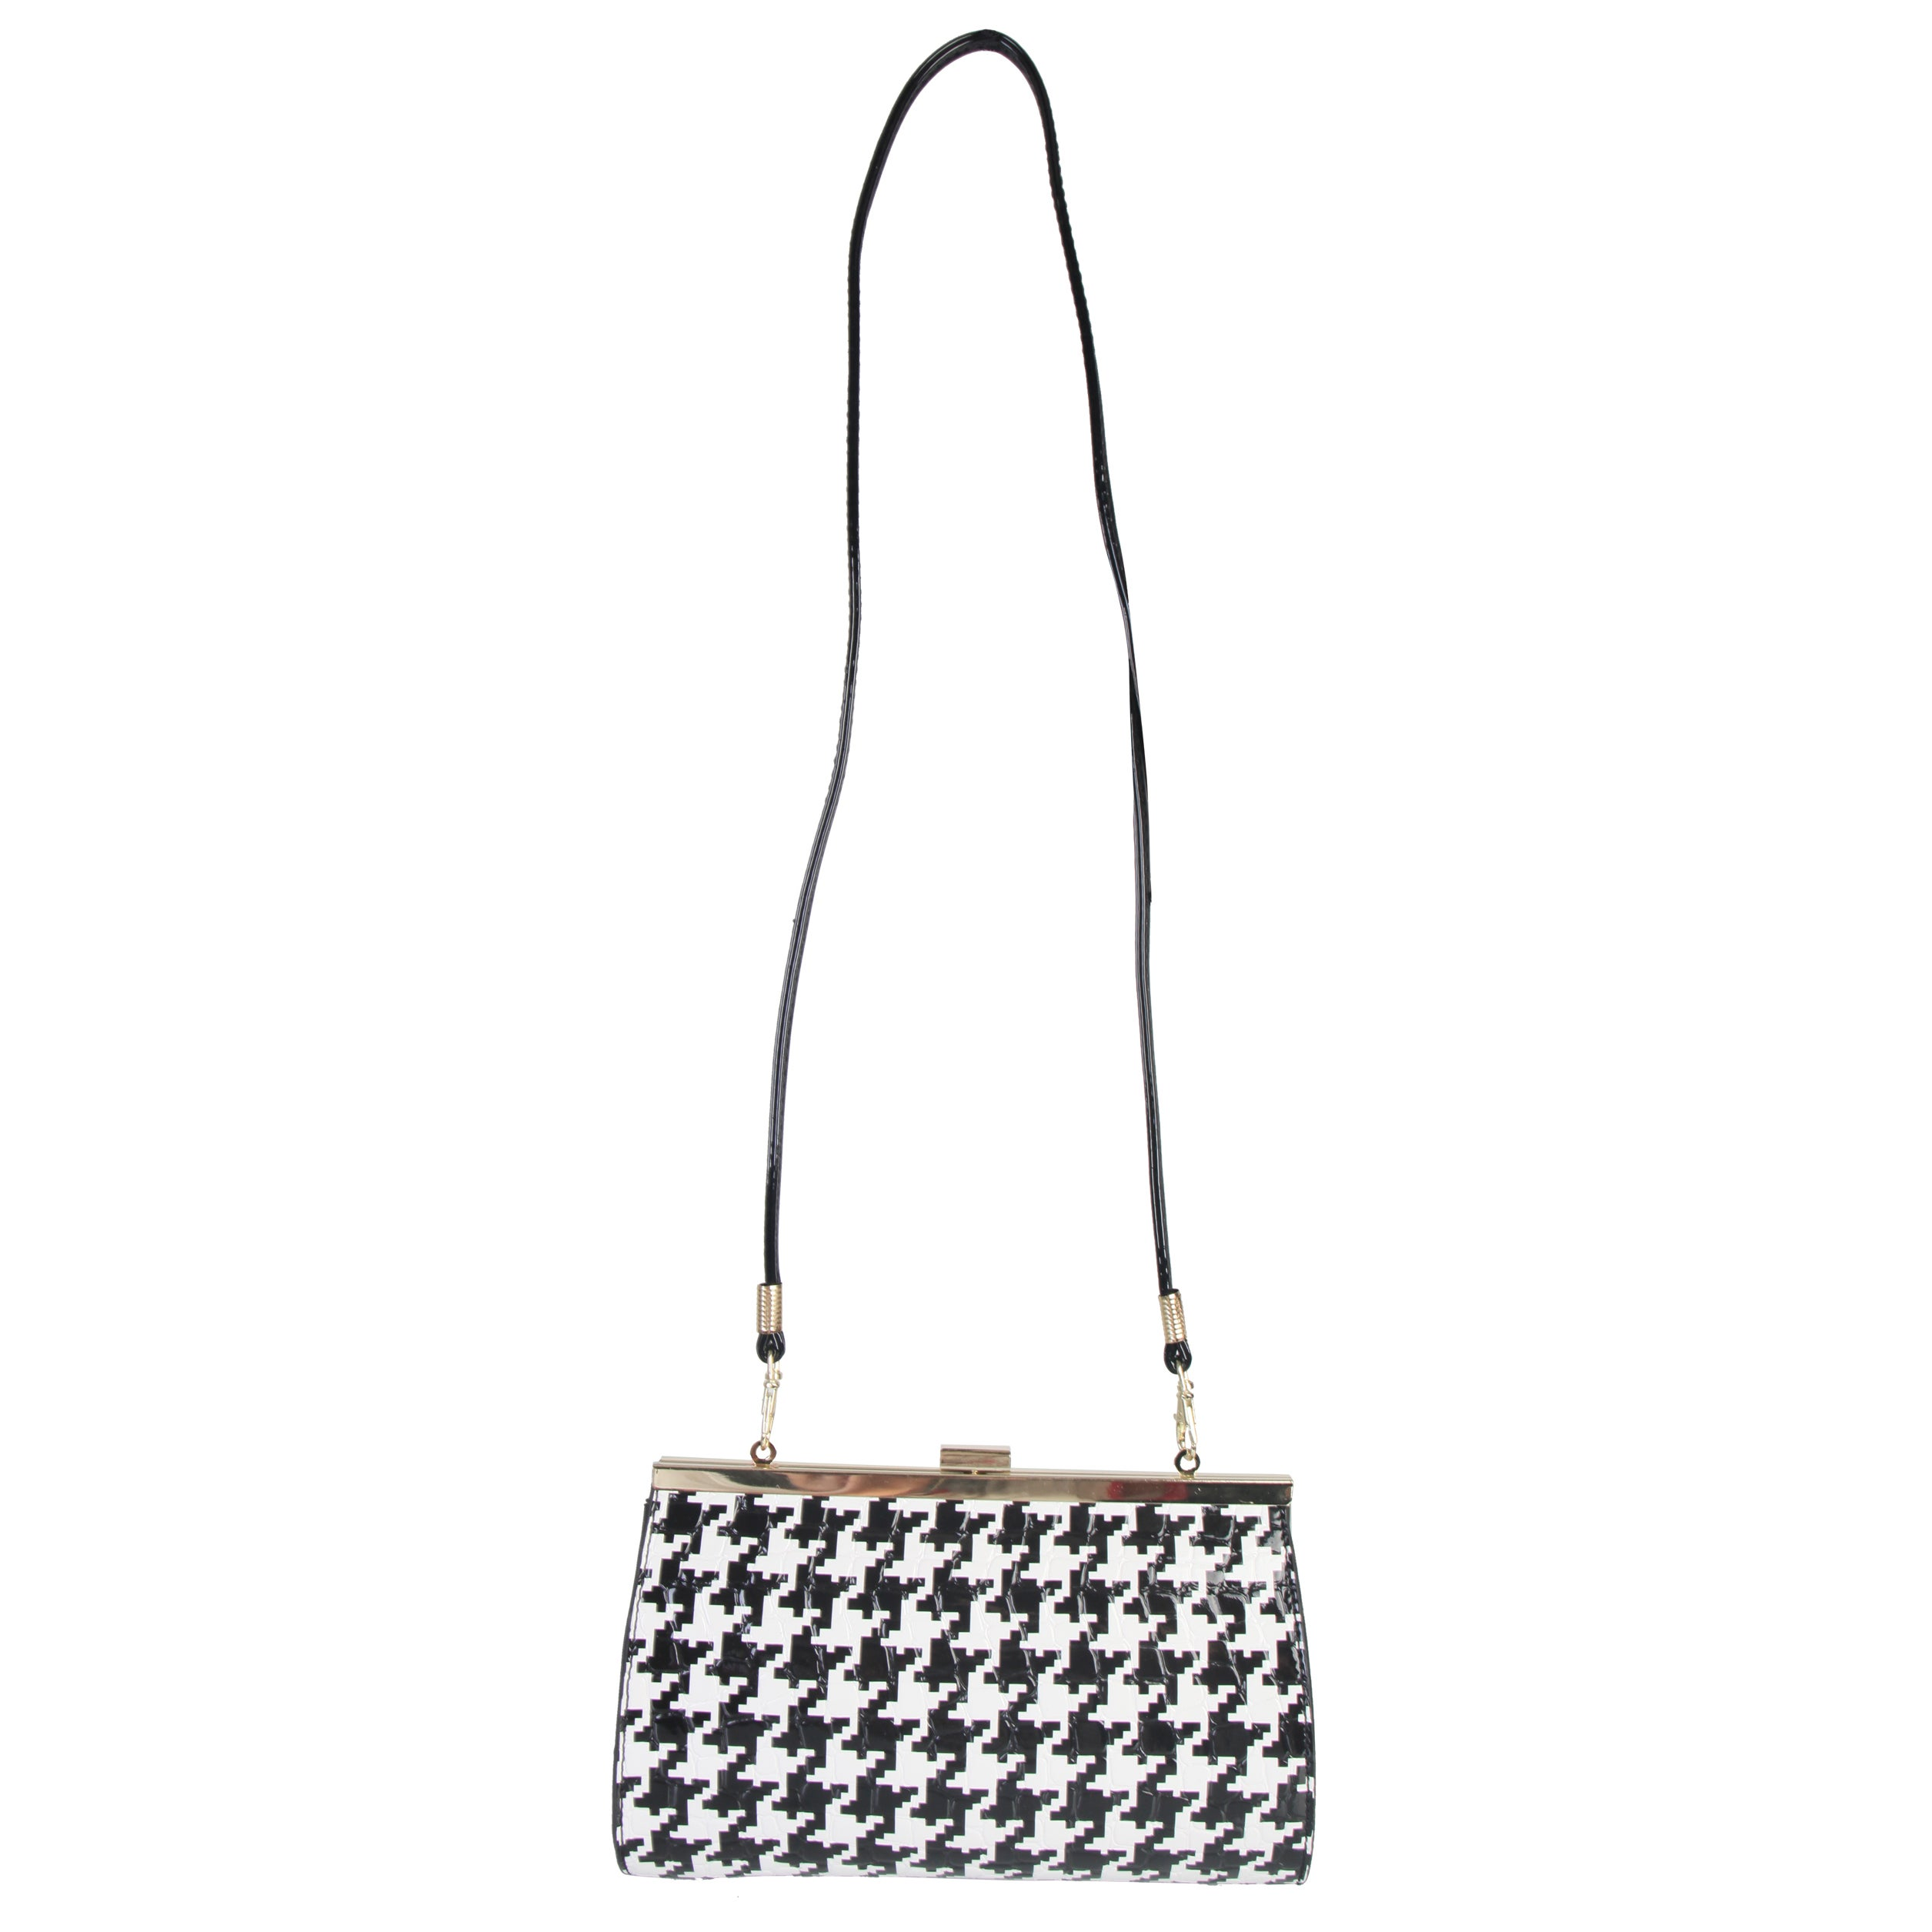 Womens Handbag and Purse Set Shoulder Bag Patent Faux Leather Black Houndstooth